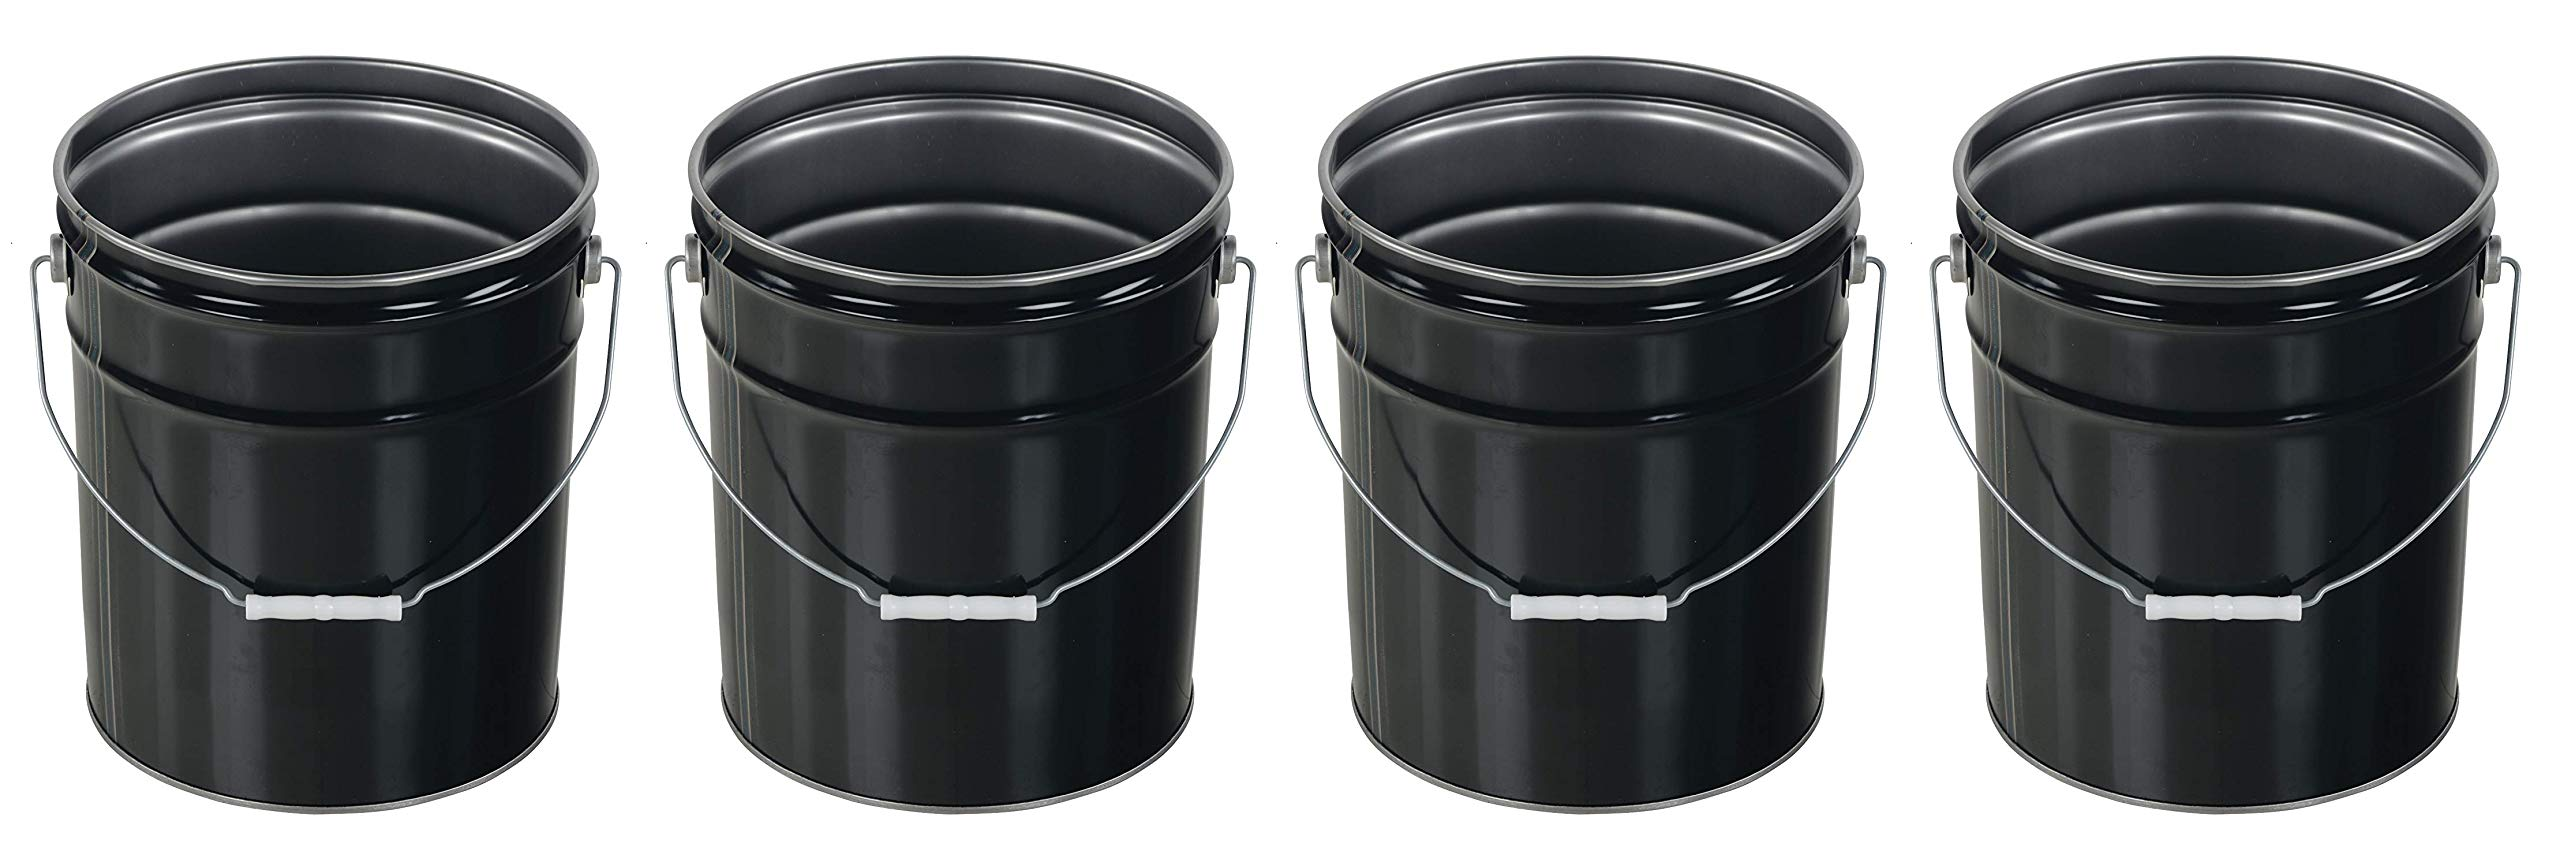 Vestil Pail-STL-RI Steel Open Head Pail with Handle, 5 Gallon Capacity, Black (Pack of 4) by Vestil (Image #1)